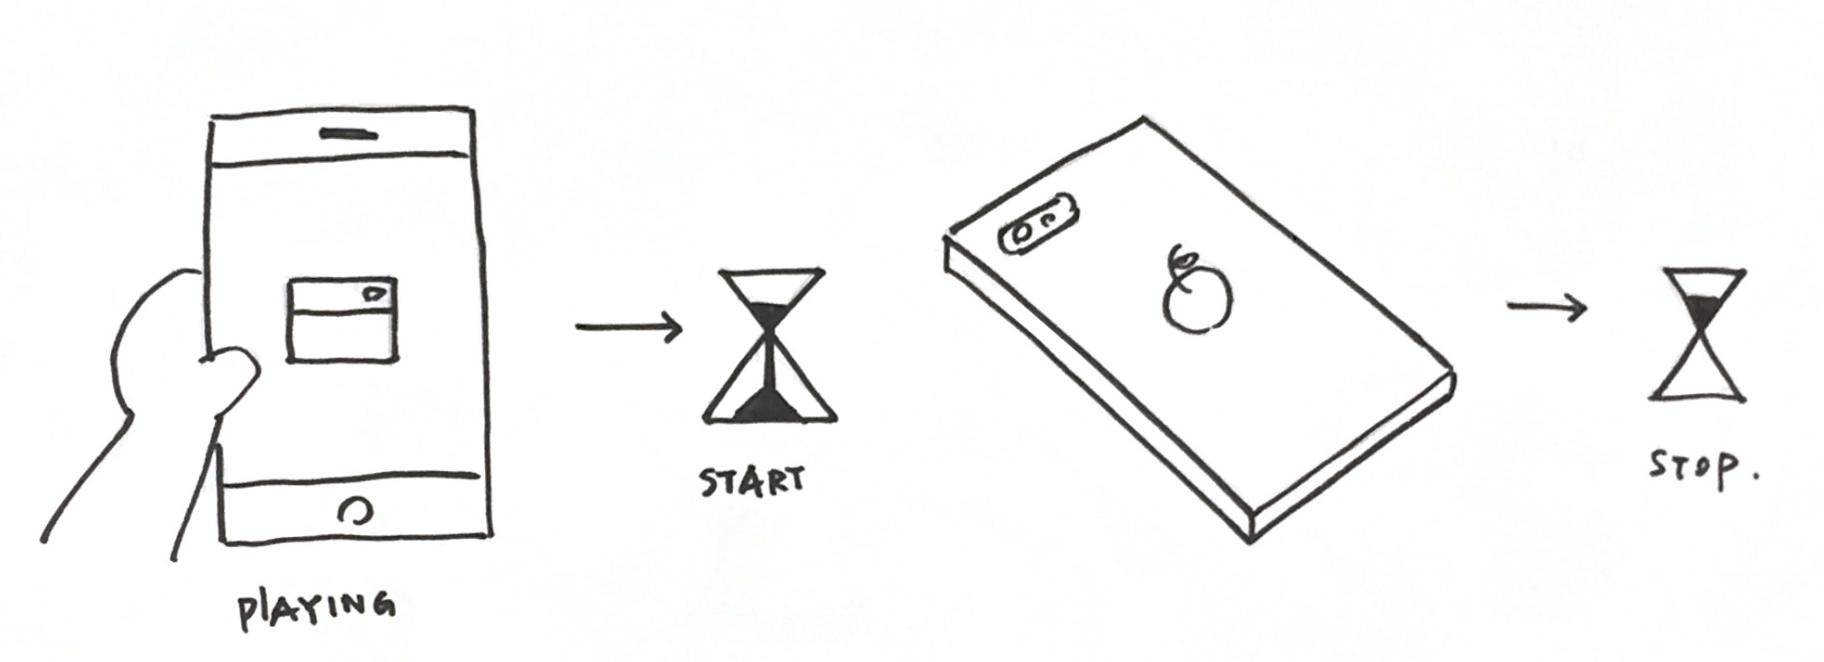 fig8_solution